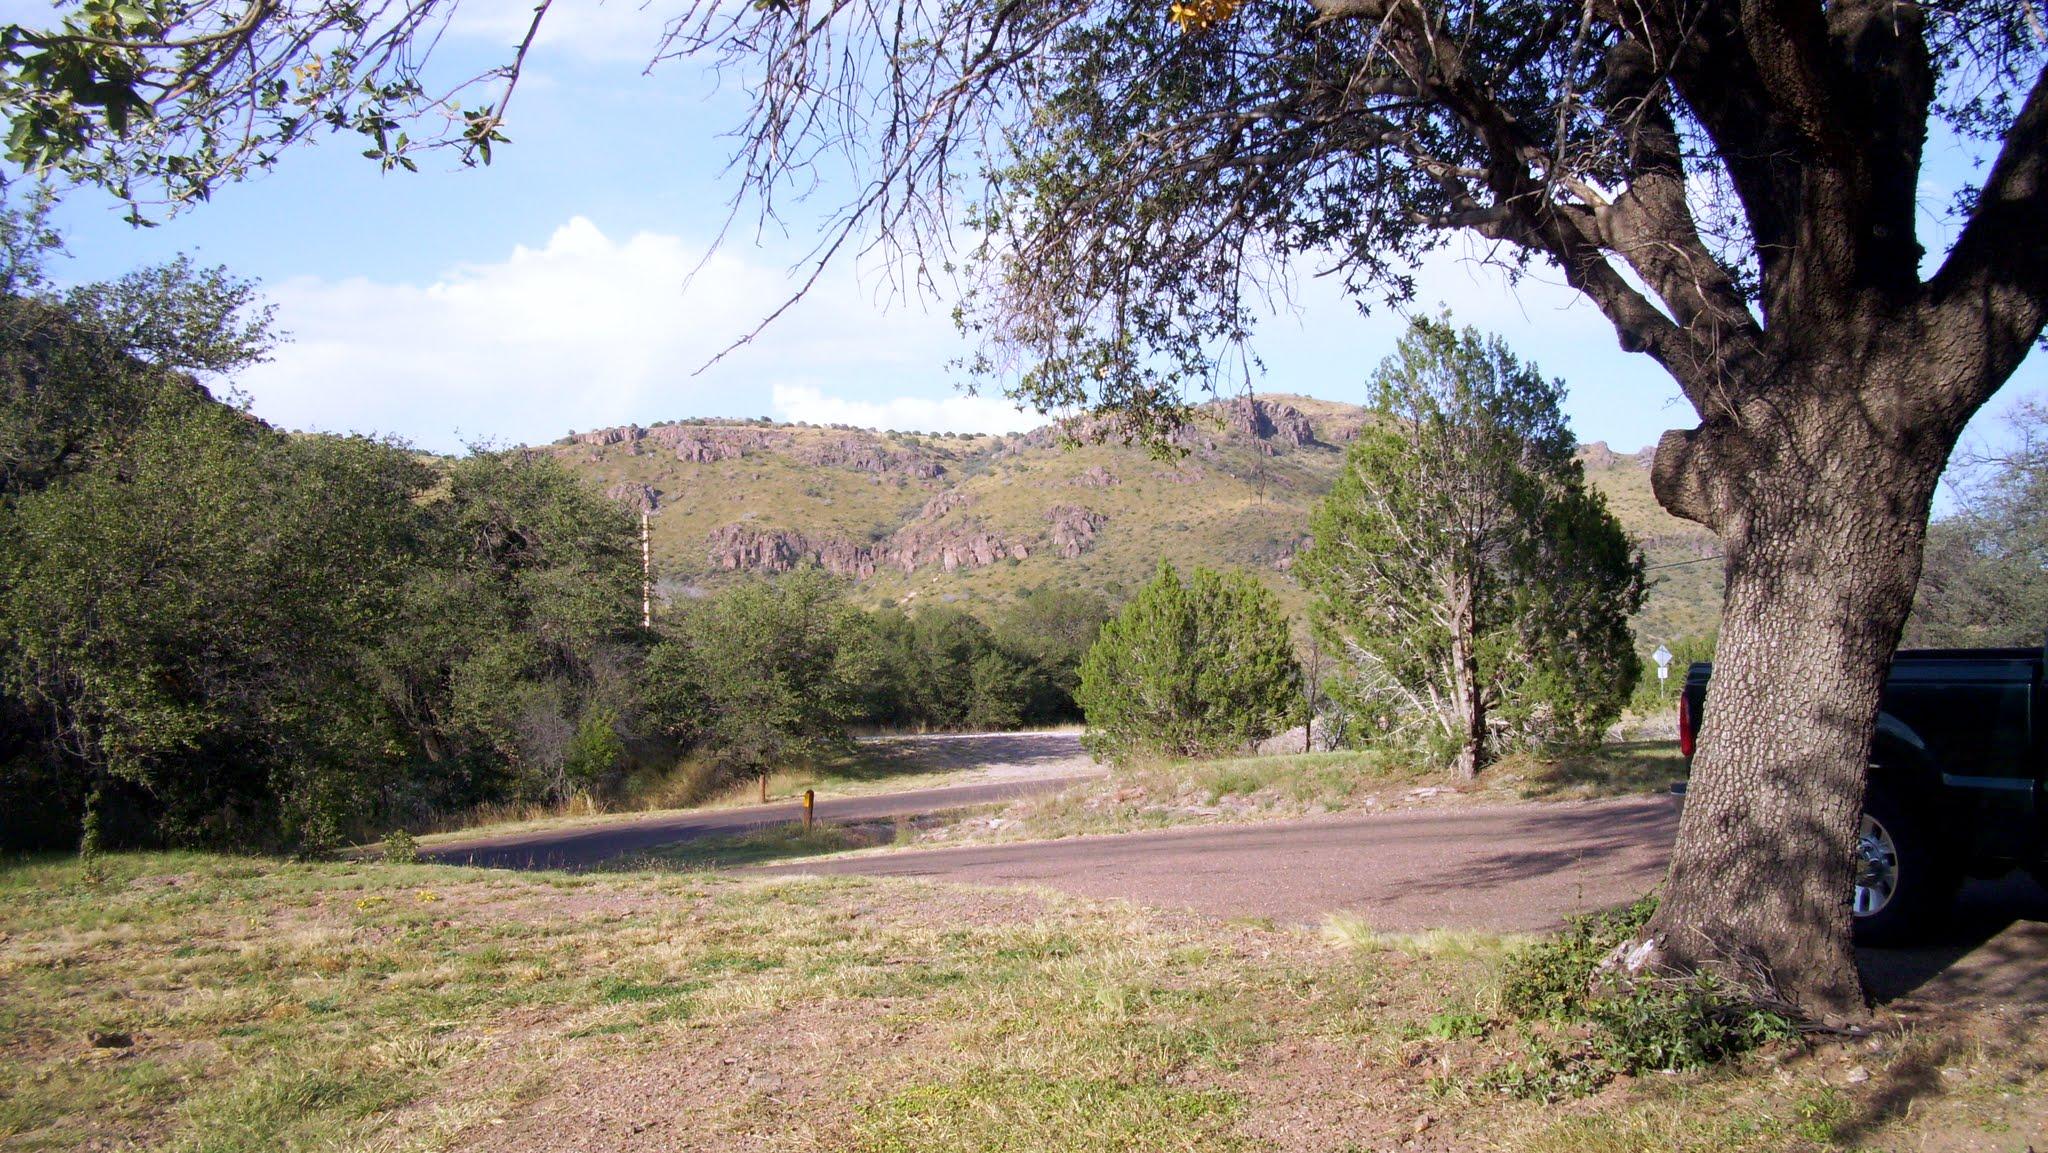 Campground review: Davis Mountains State Park - Fort Davis ...